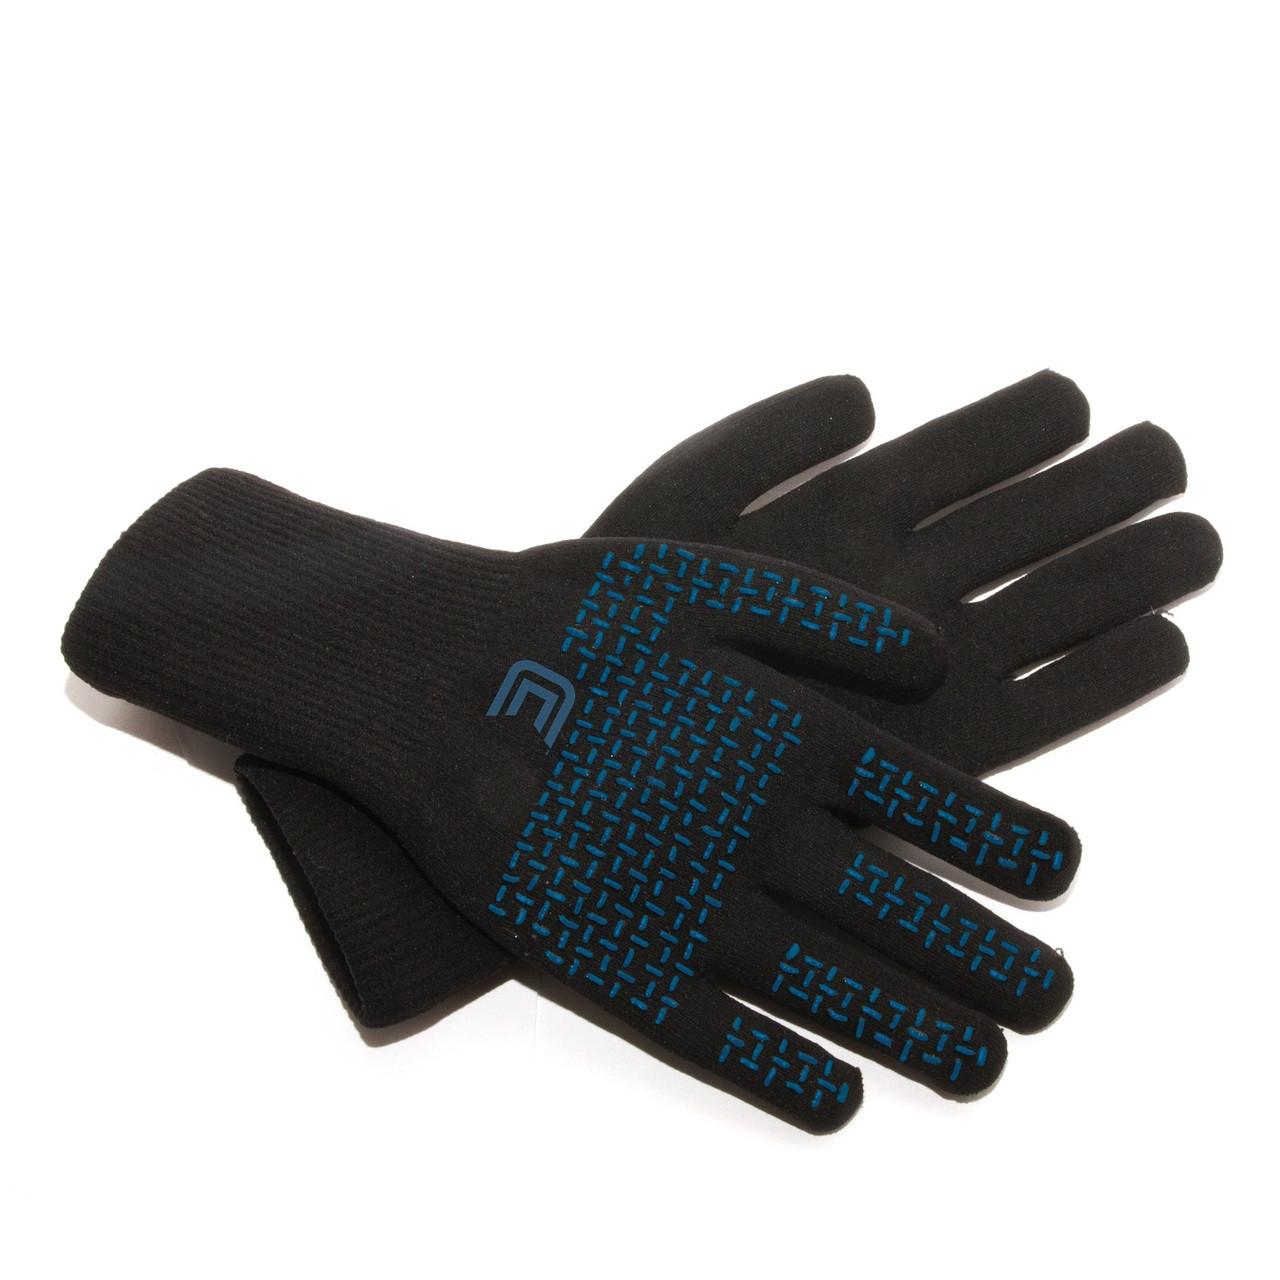 Clam Outdoors IceArmor DrySkinz Ice Fishing Gloves